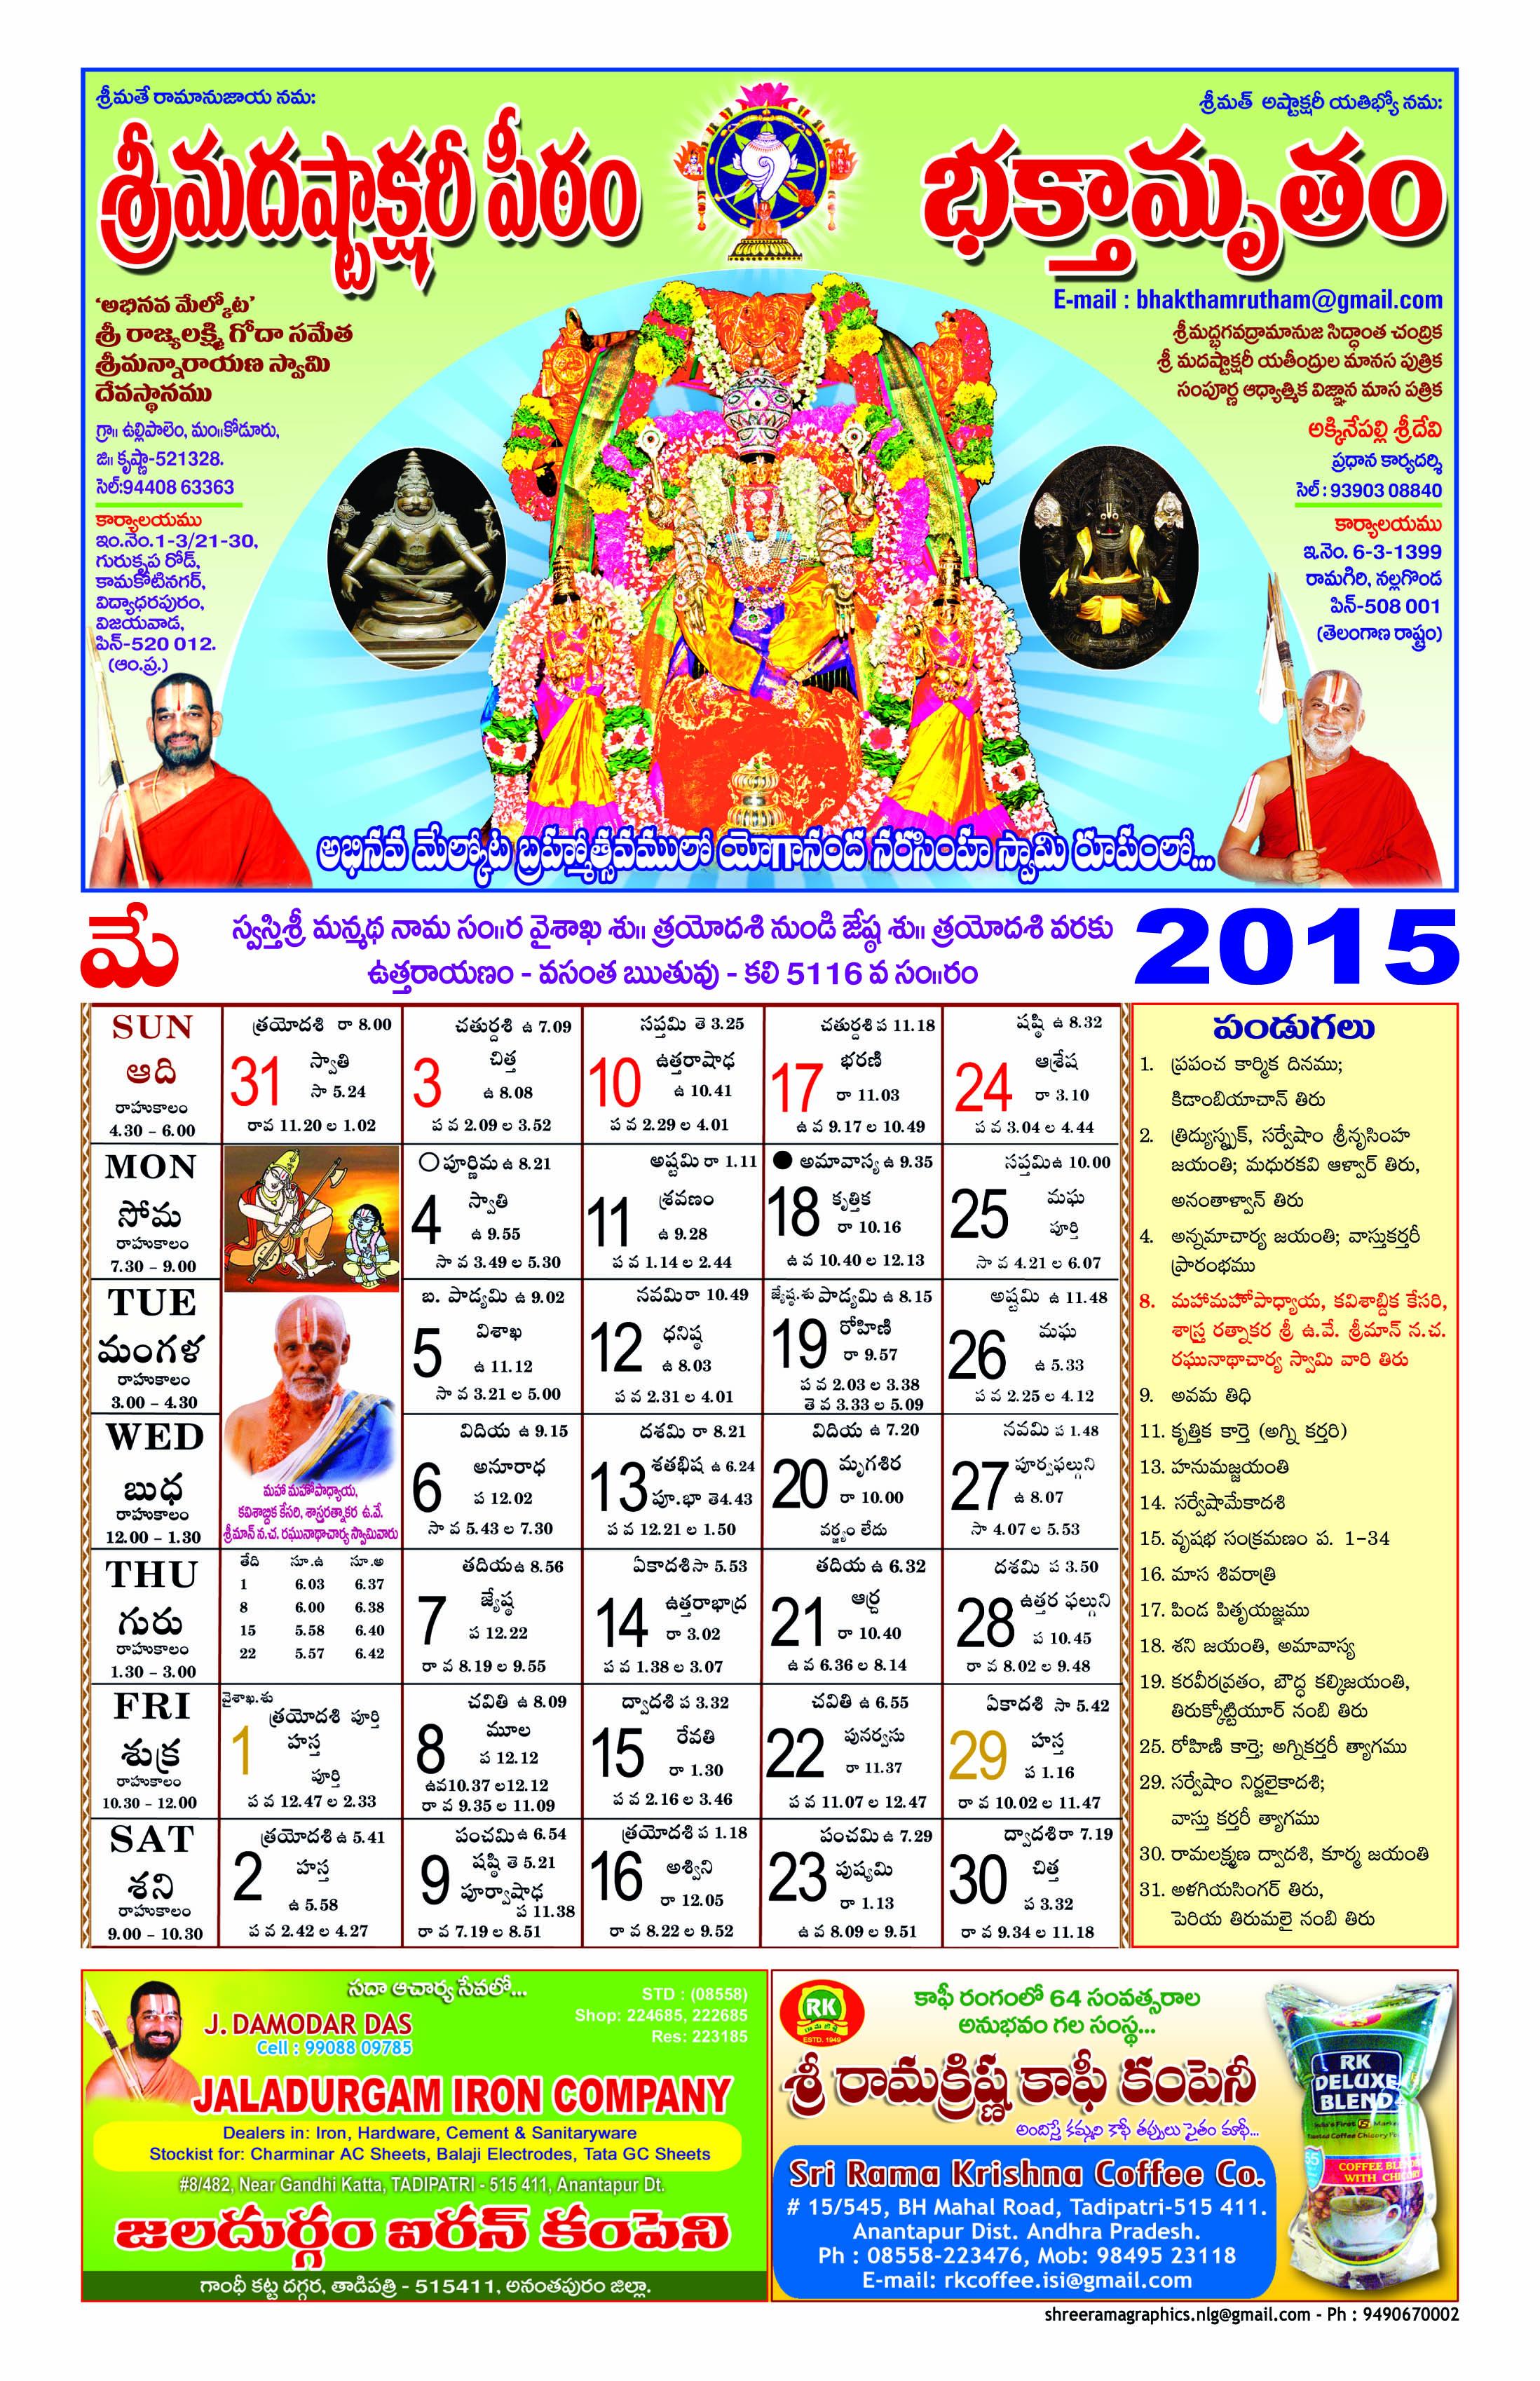 march 2015 telugu calendar - DriverLayer Search Engine